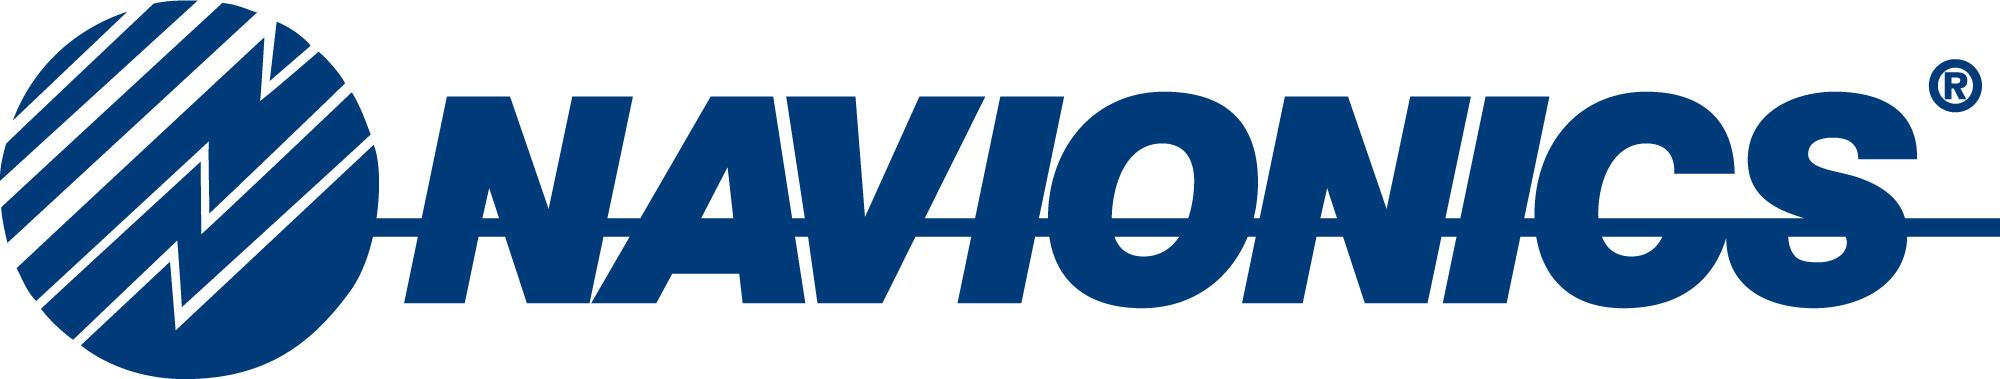 Navionics Logo